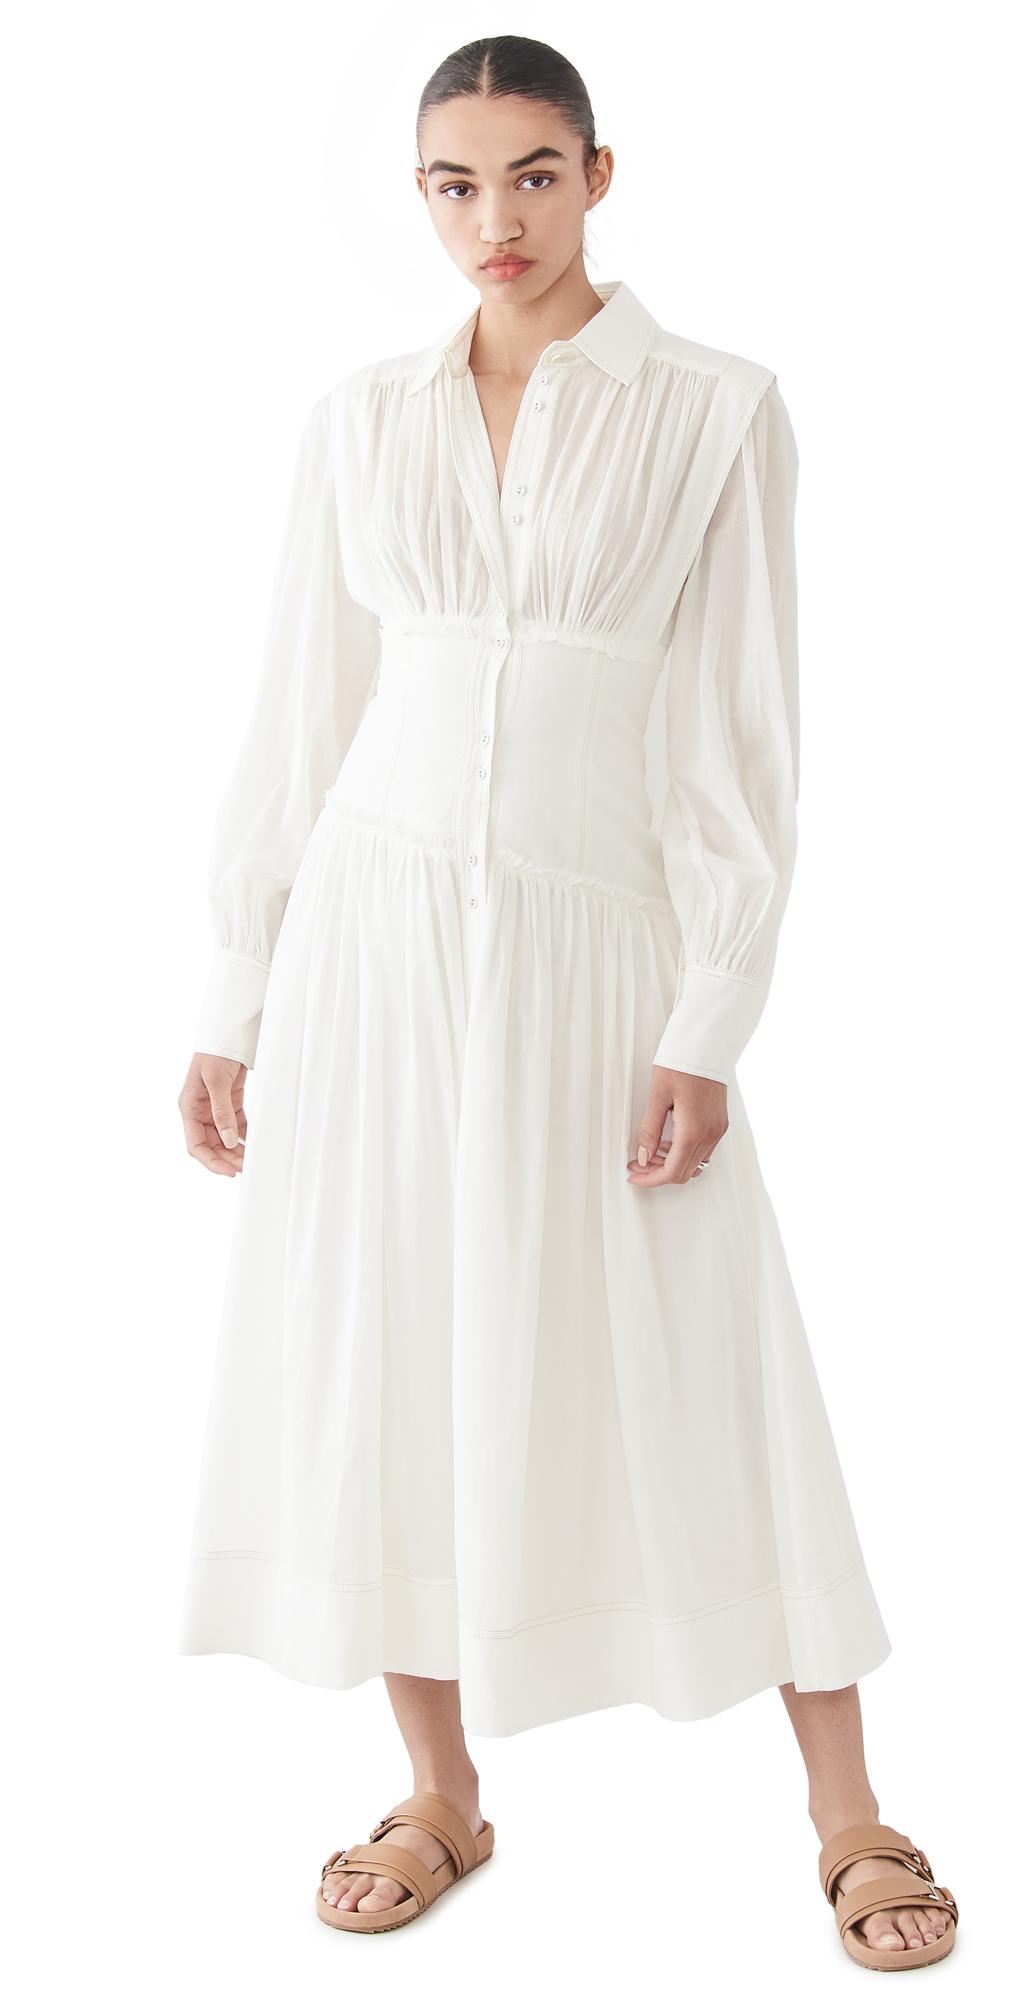 Aje Utopia Long Sleeve Dress